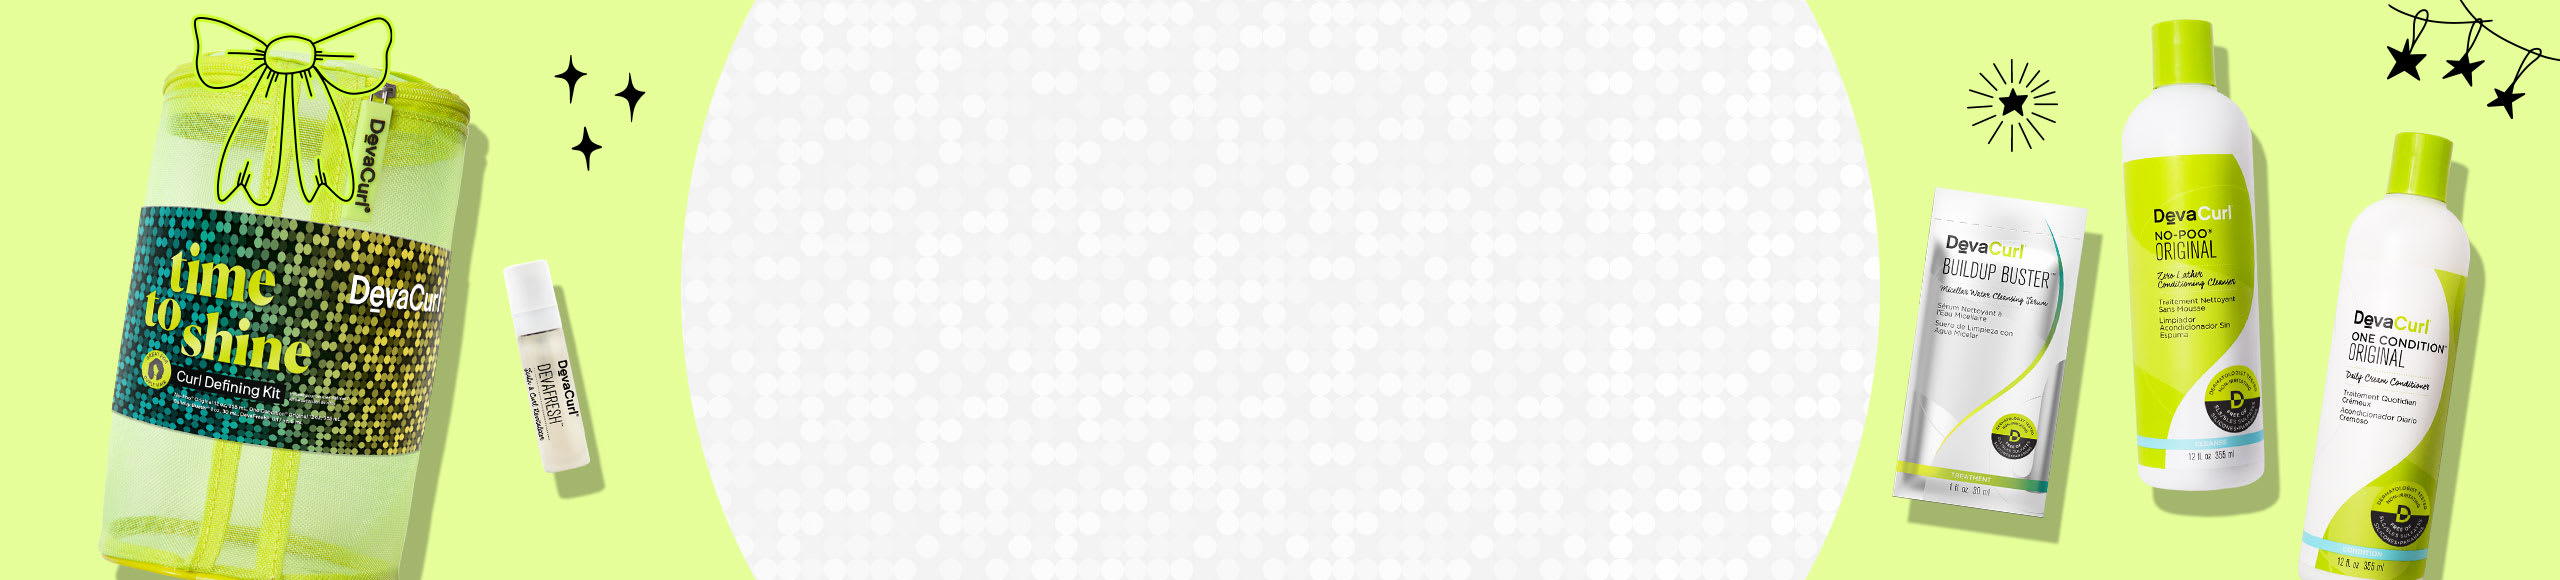 cmsData.image_desktop.alt_text